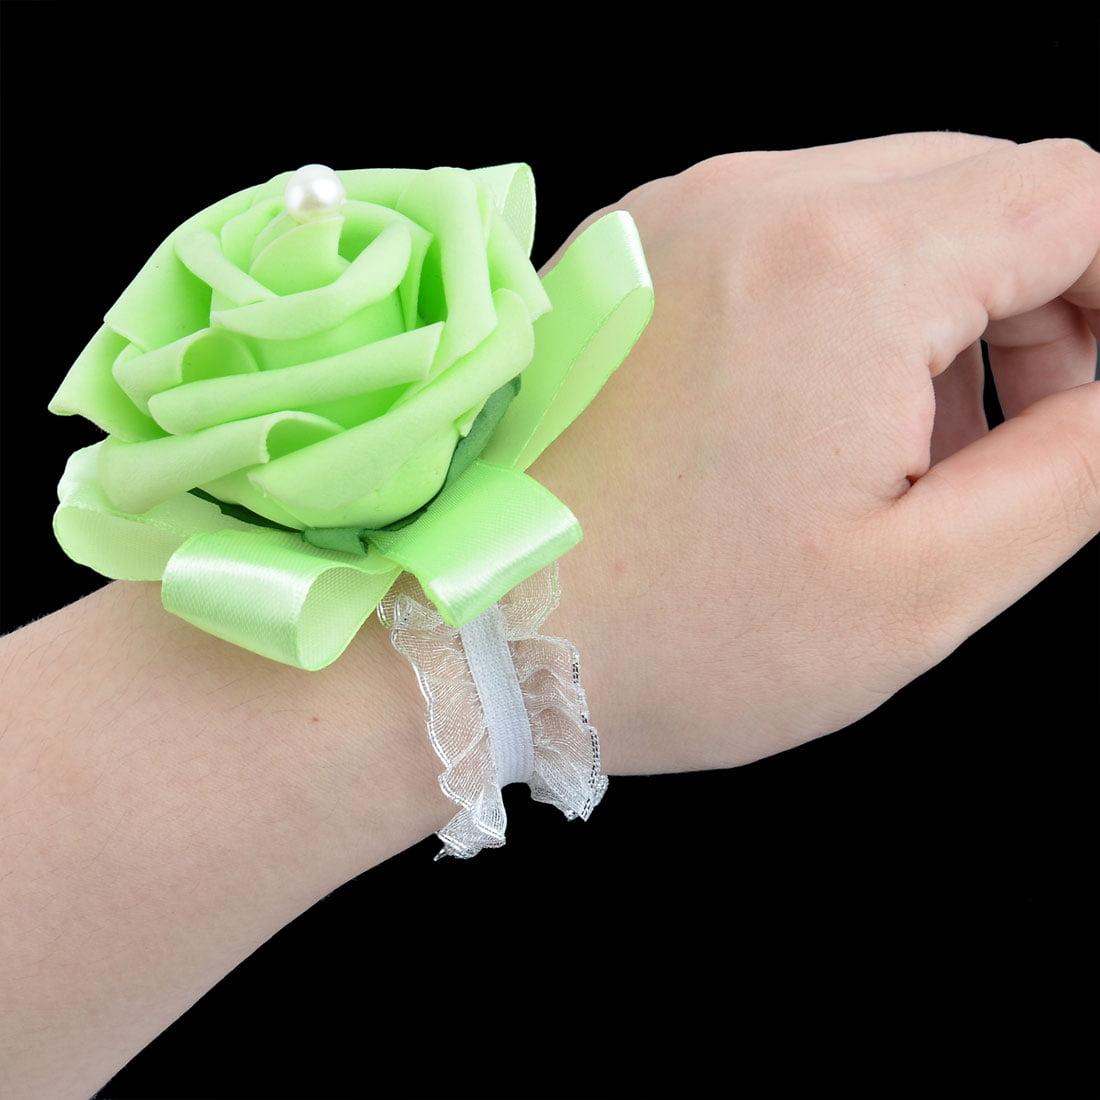 Unique Bargains Foam Rose Design Bridesmaid Hand Decorative Artificial Wrist Flower Light Green - image 2 of 3